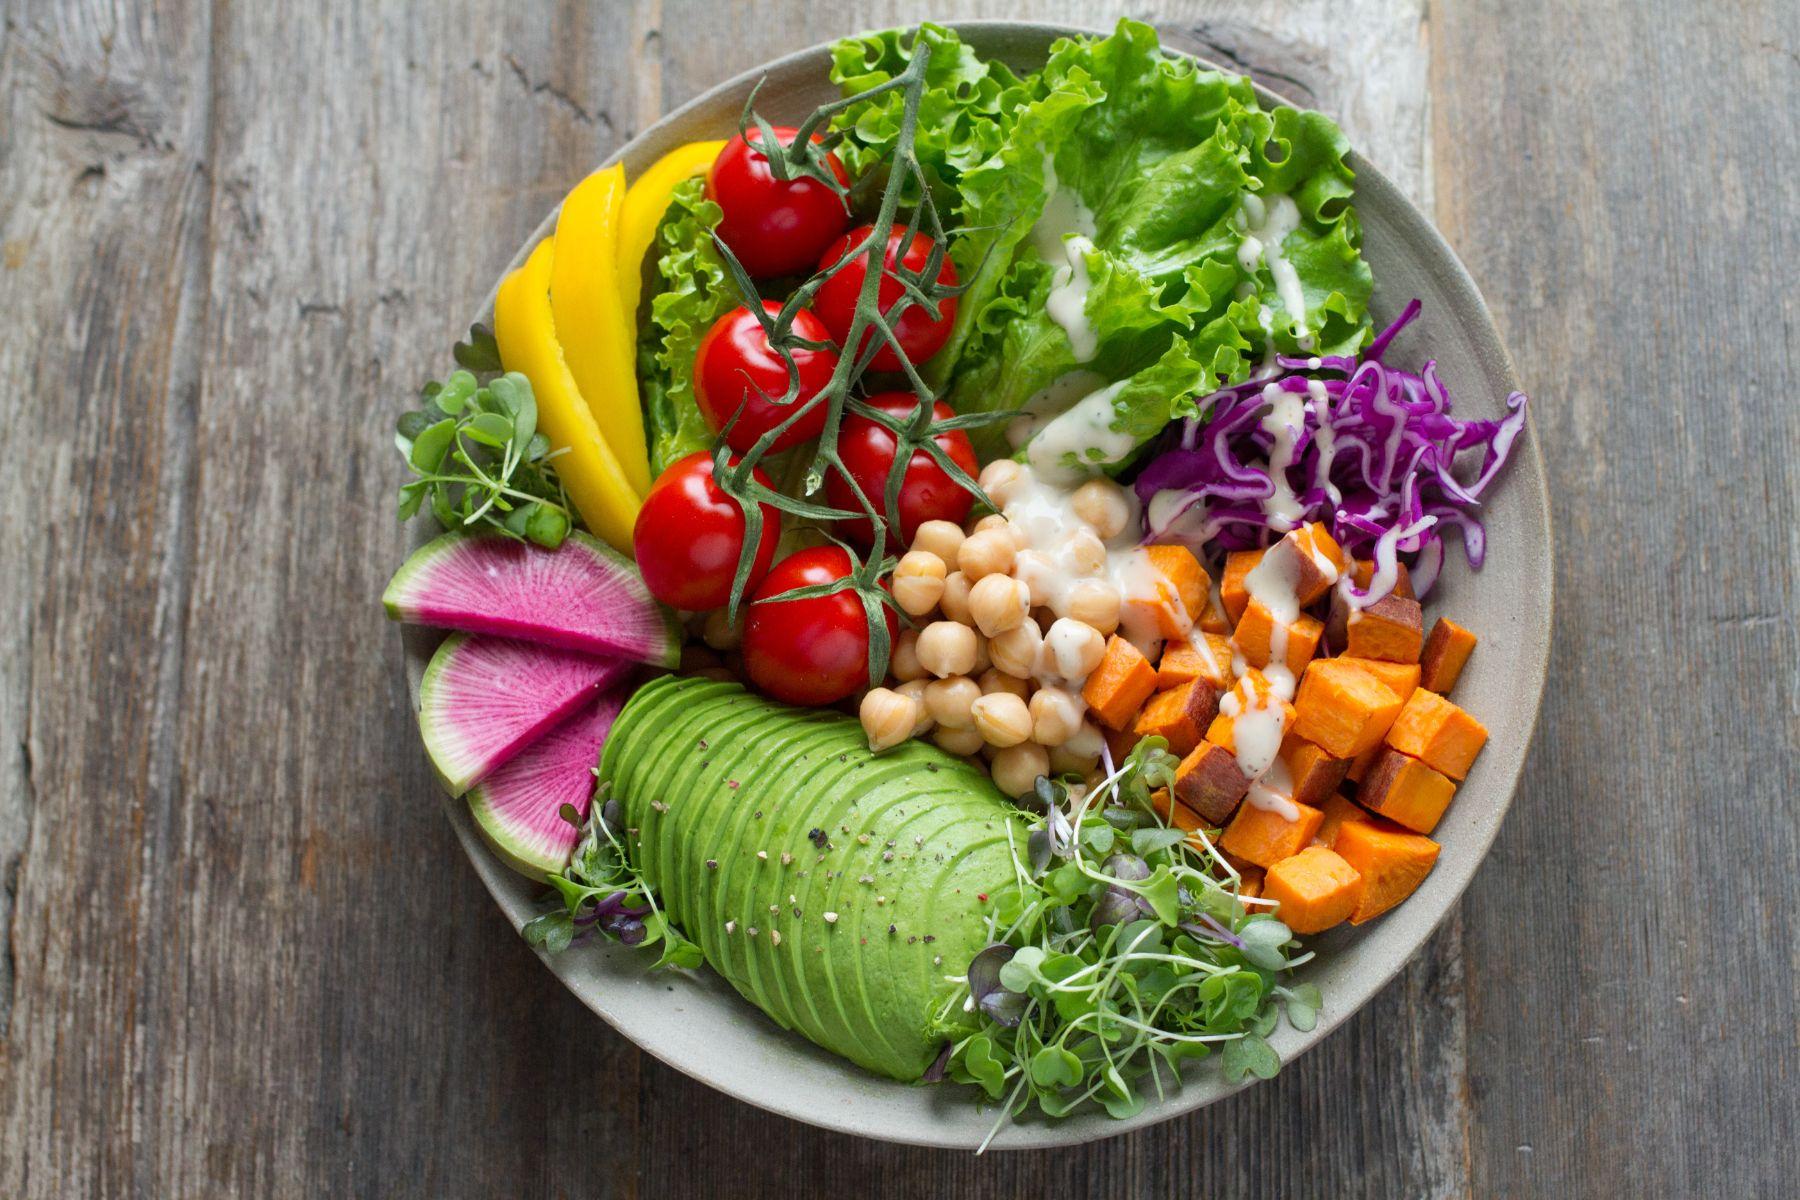 Good Food, Better Mood - It's Alimentary!